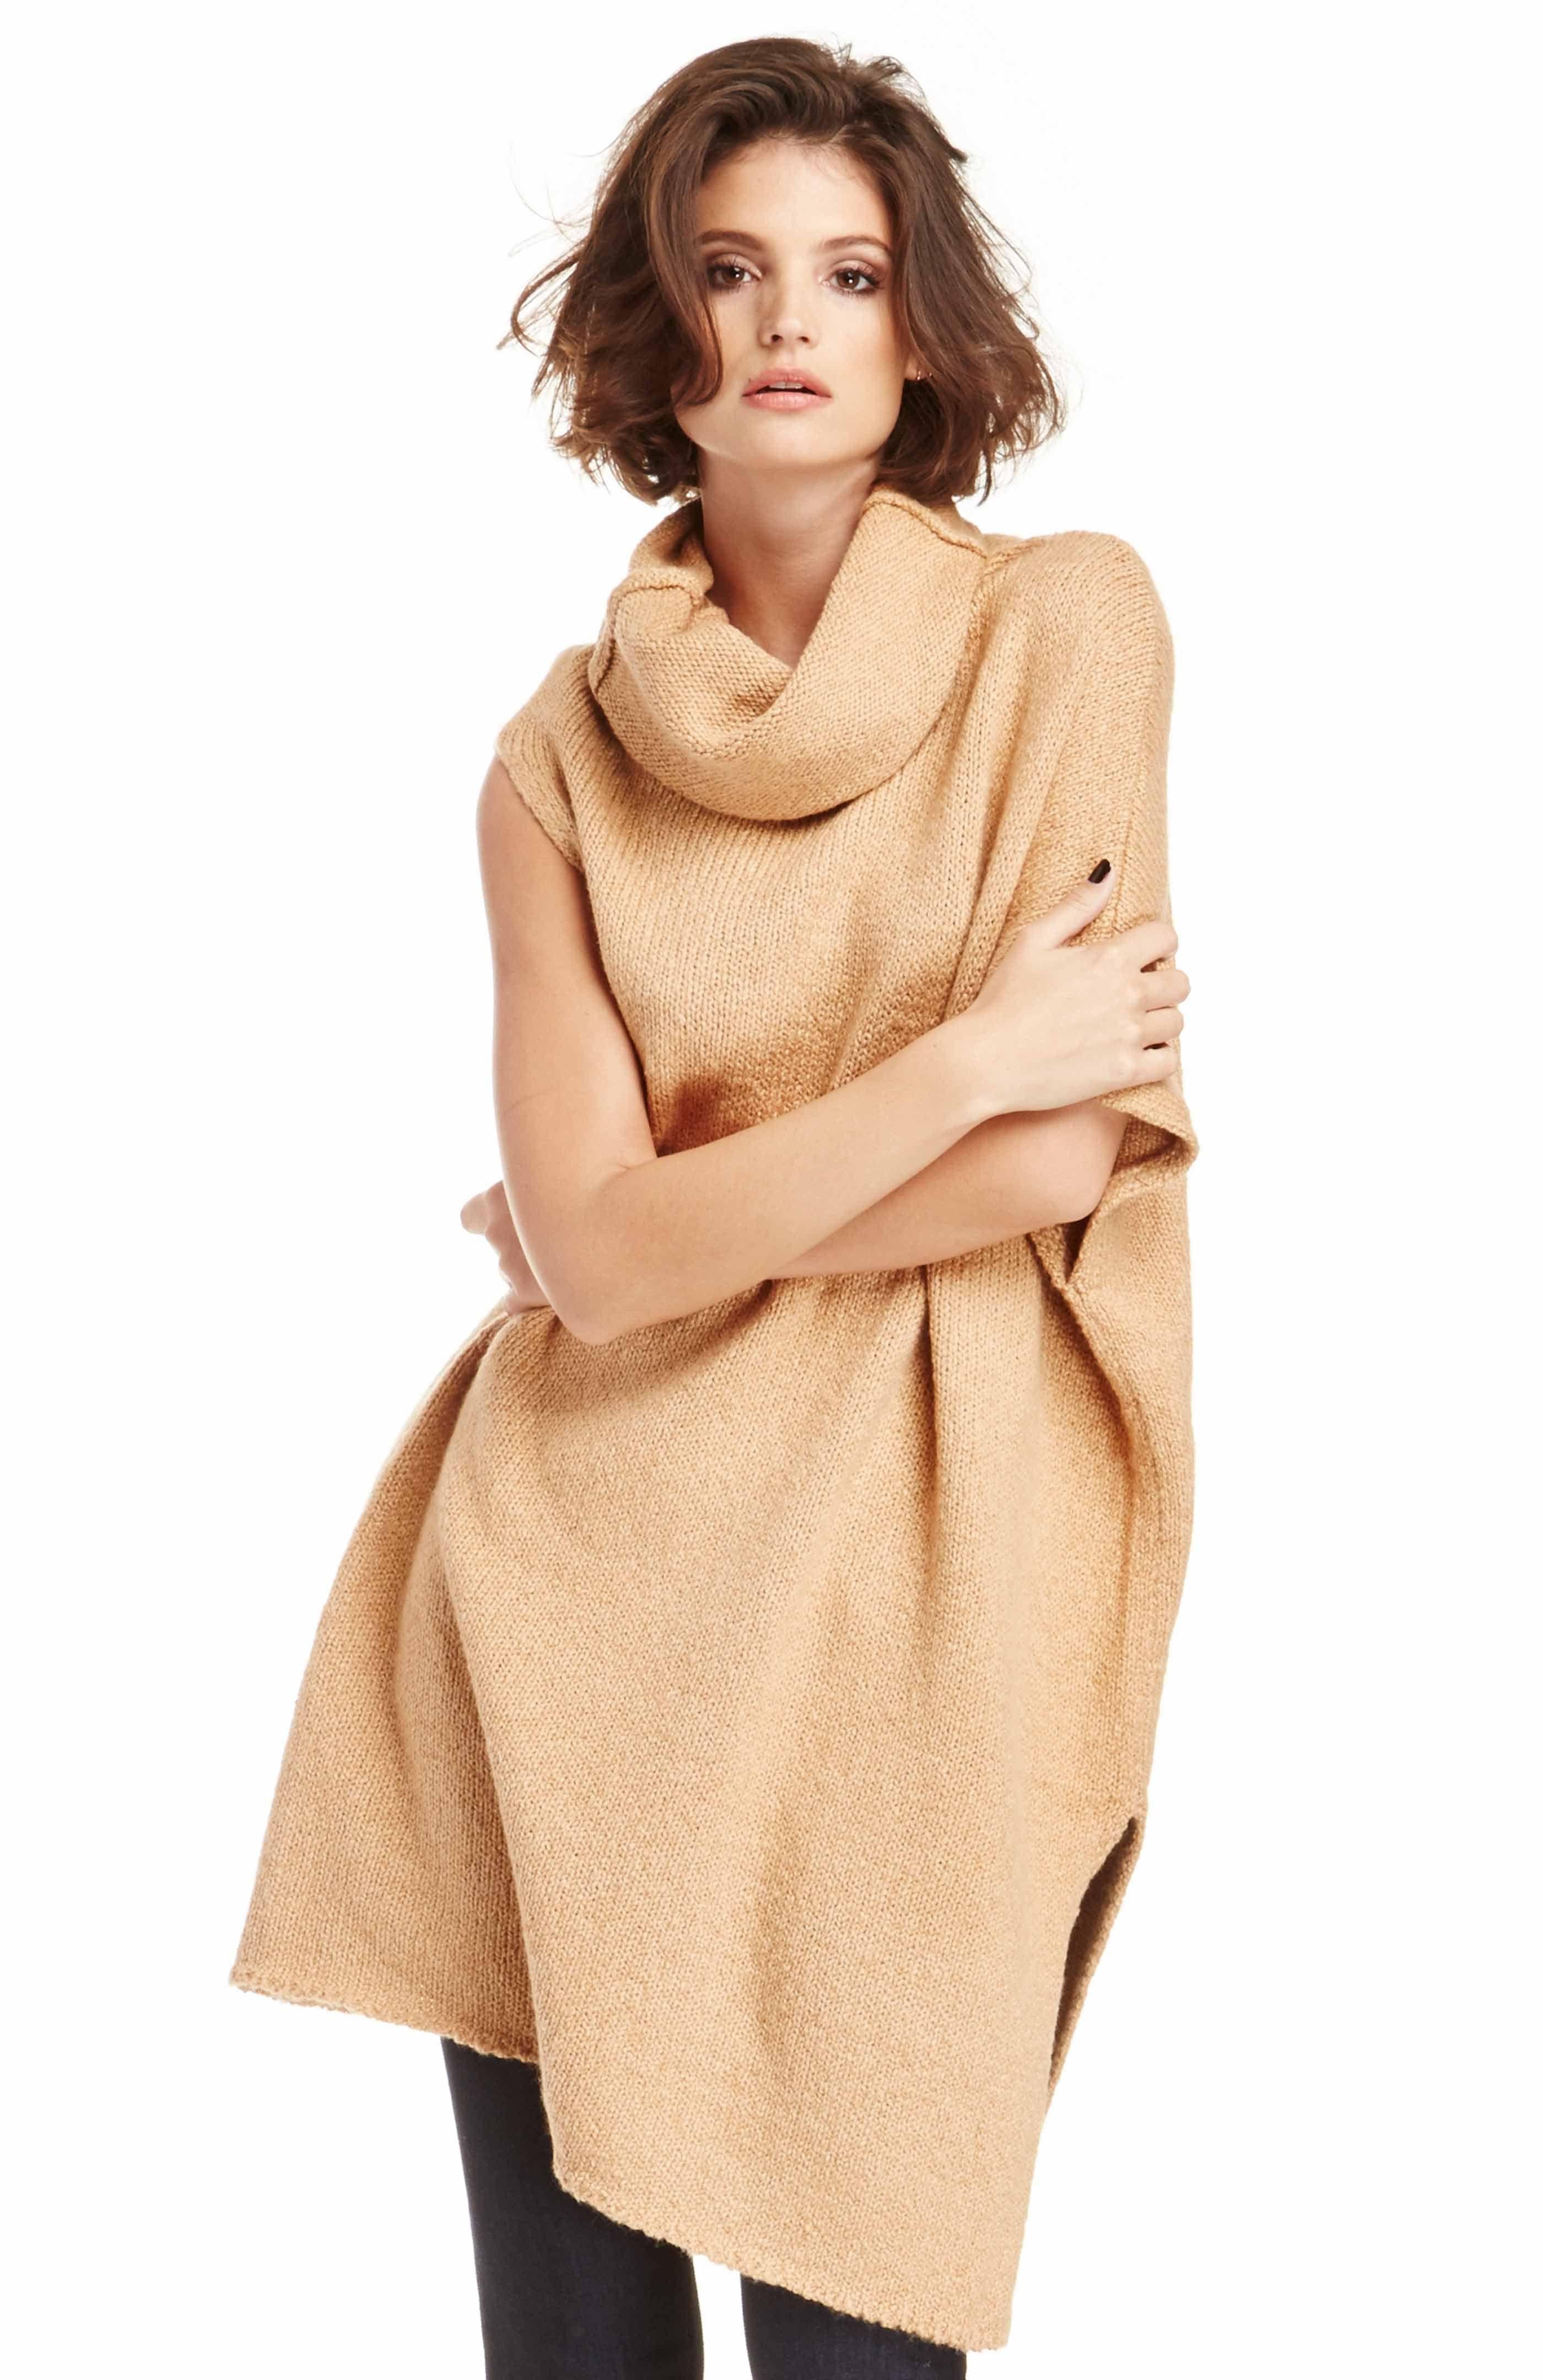 DailyLook: T.Yorke Cotton Turtleneck Sweater in Camel One Size